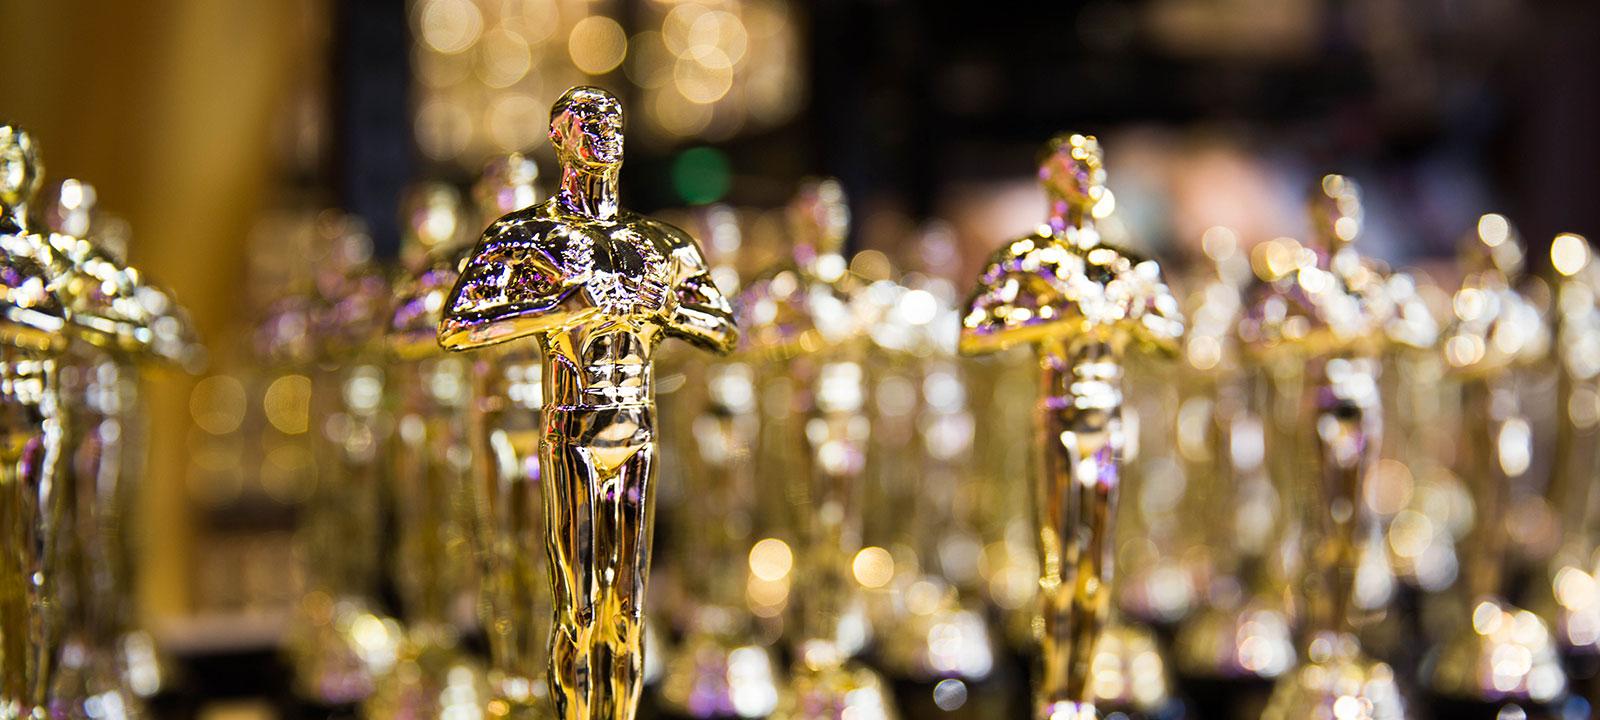 Oscar statuettes in a row